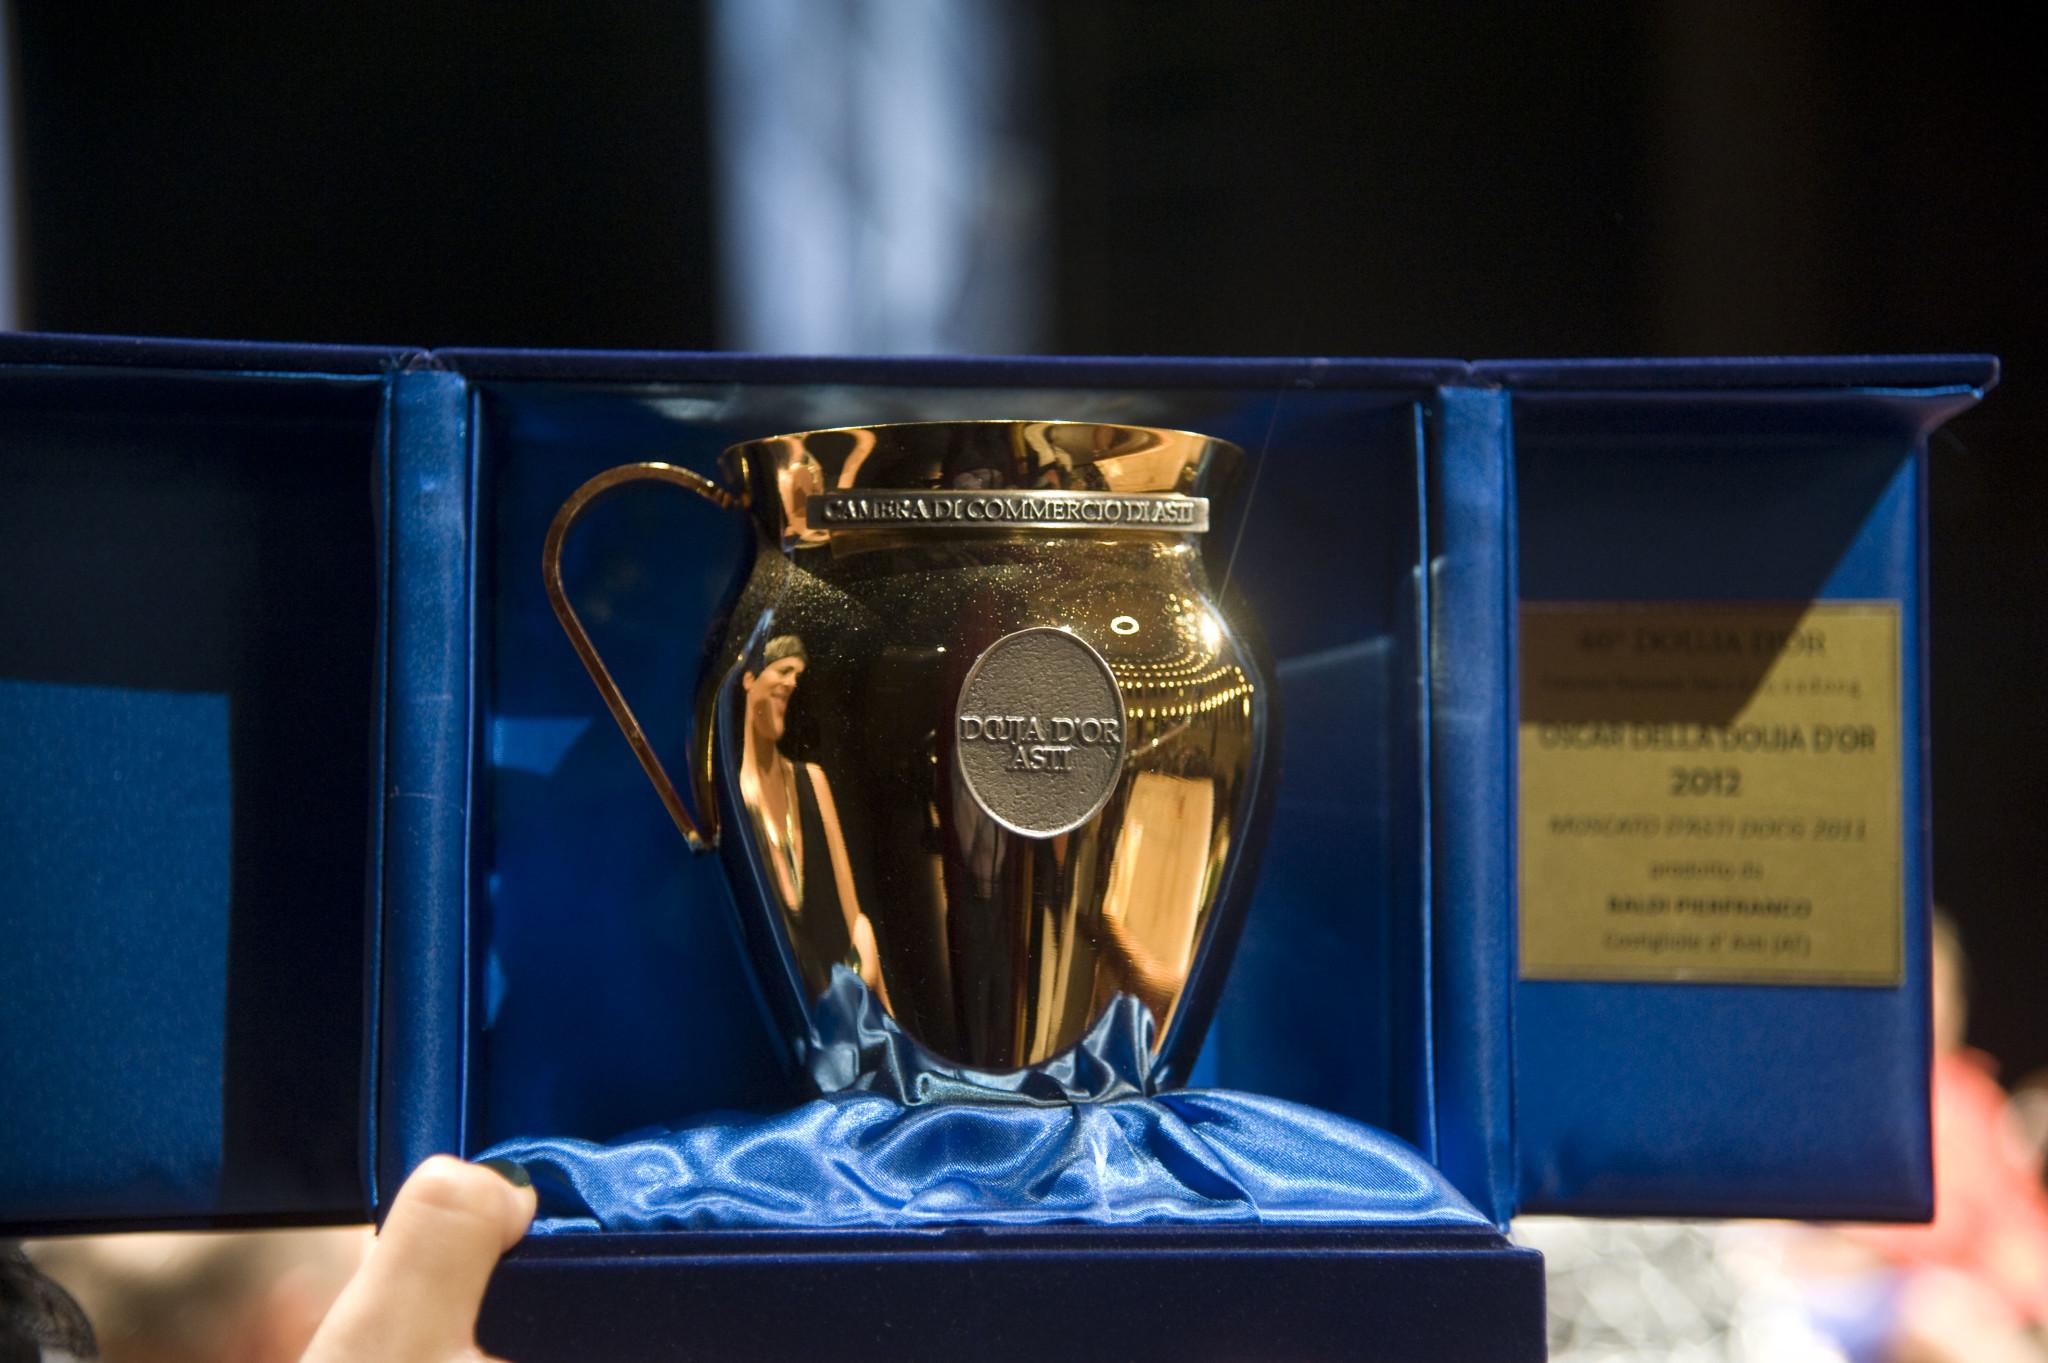 La Douja d'Or, Oscar dei vini italiani